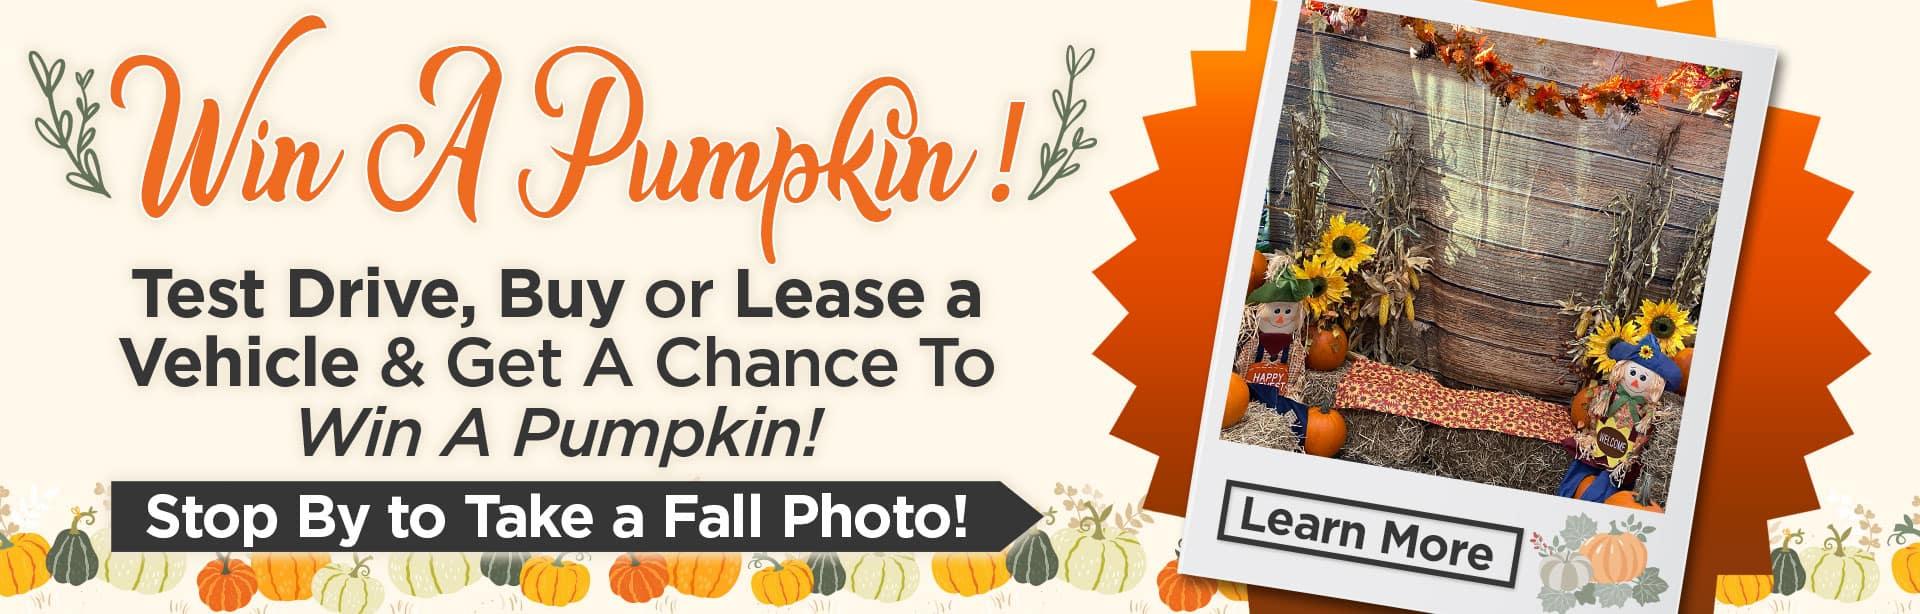 Win a Pumpkin at Bev Smith Toyota!